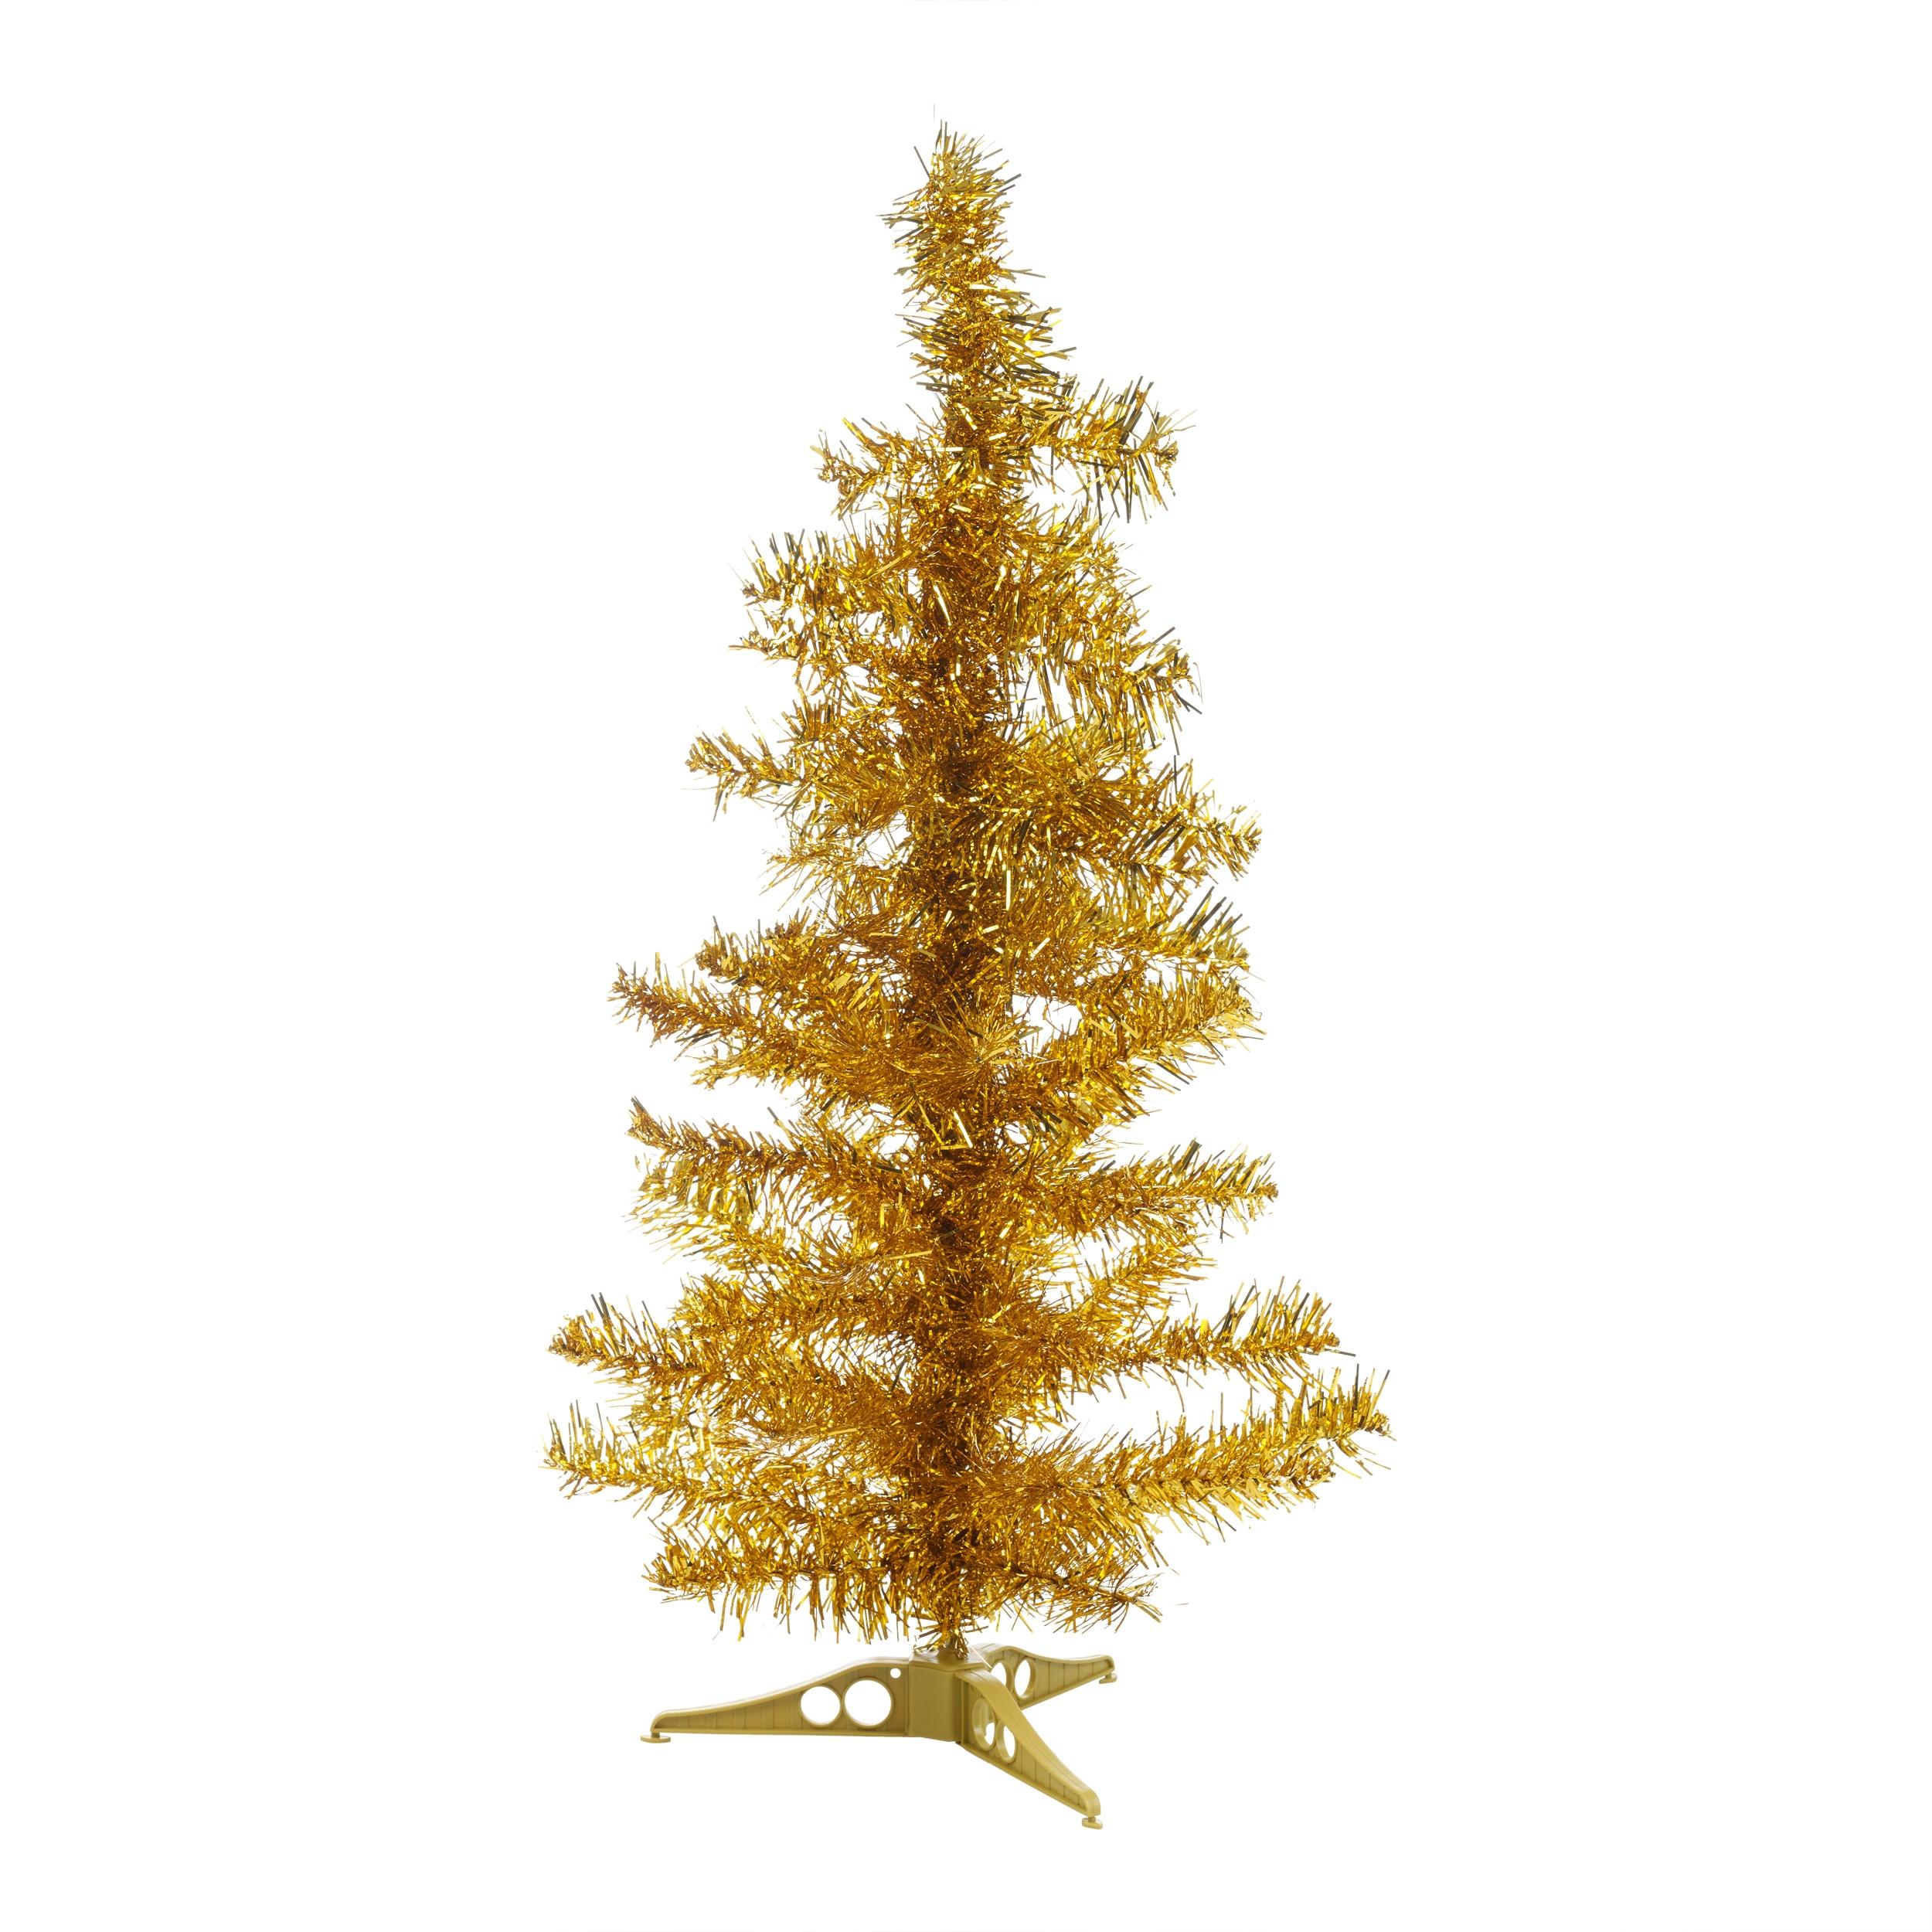 Tinsel Christmas Tree: Christmas Tinsel Tree Xmas Window Decoration Ornament